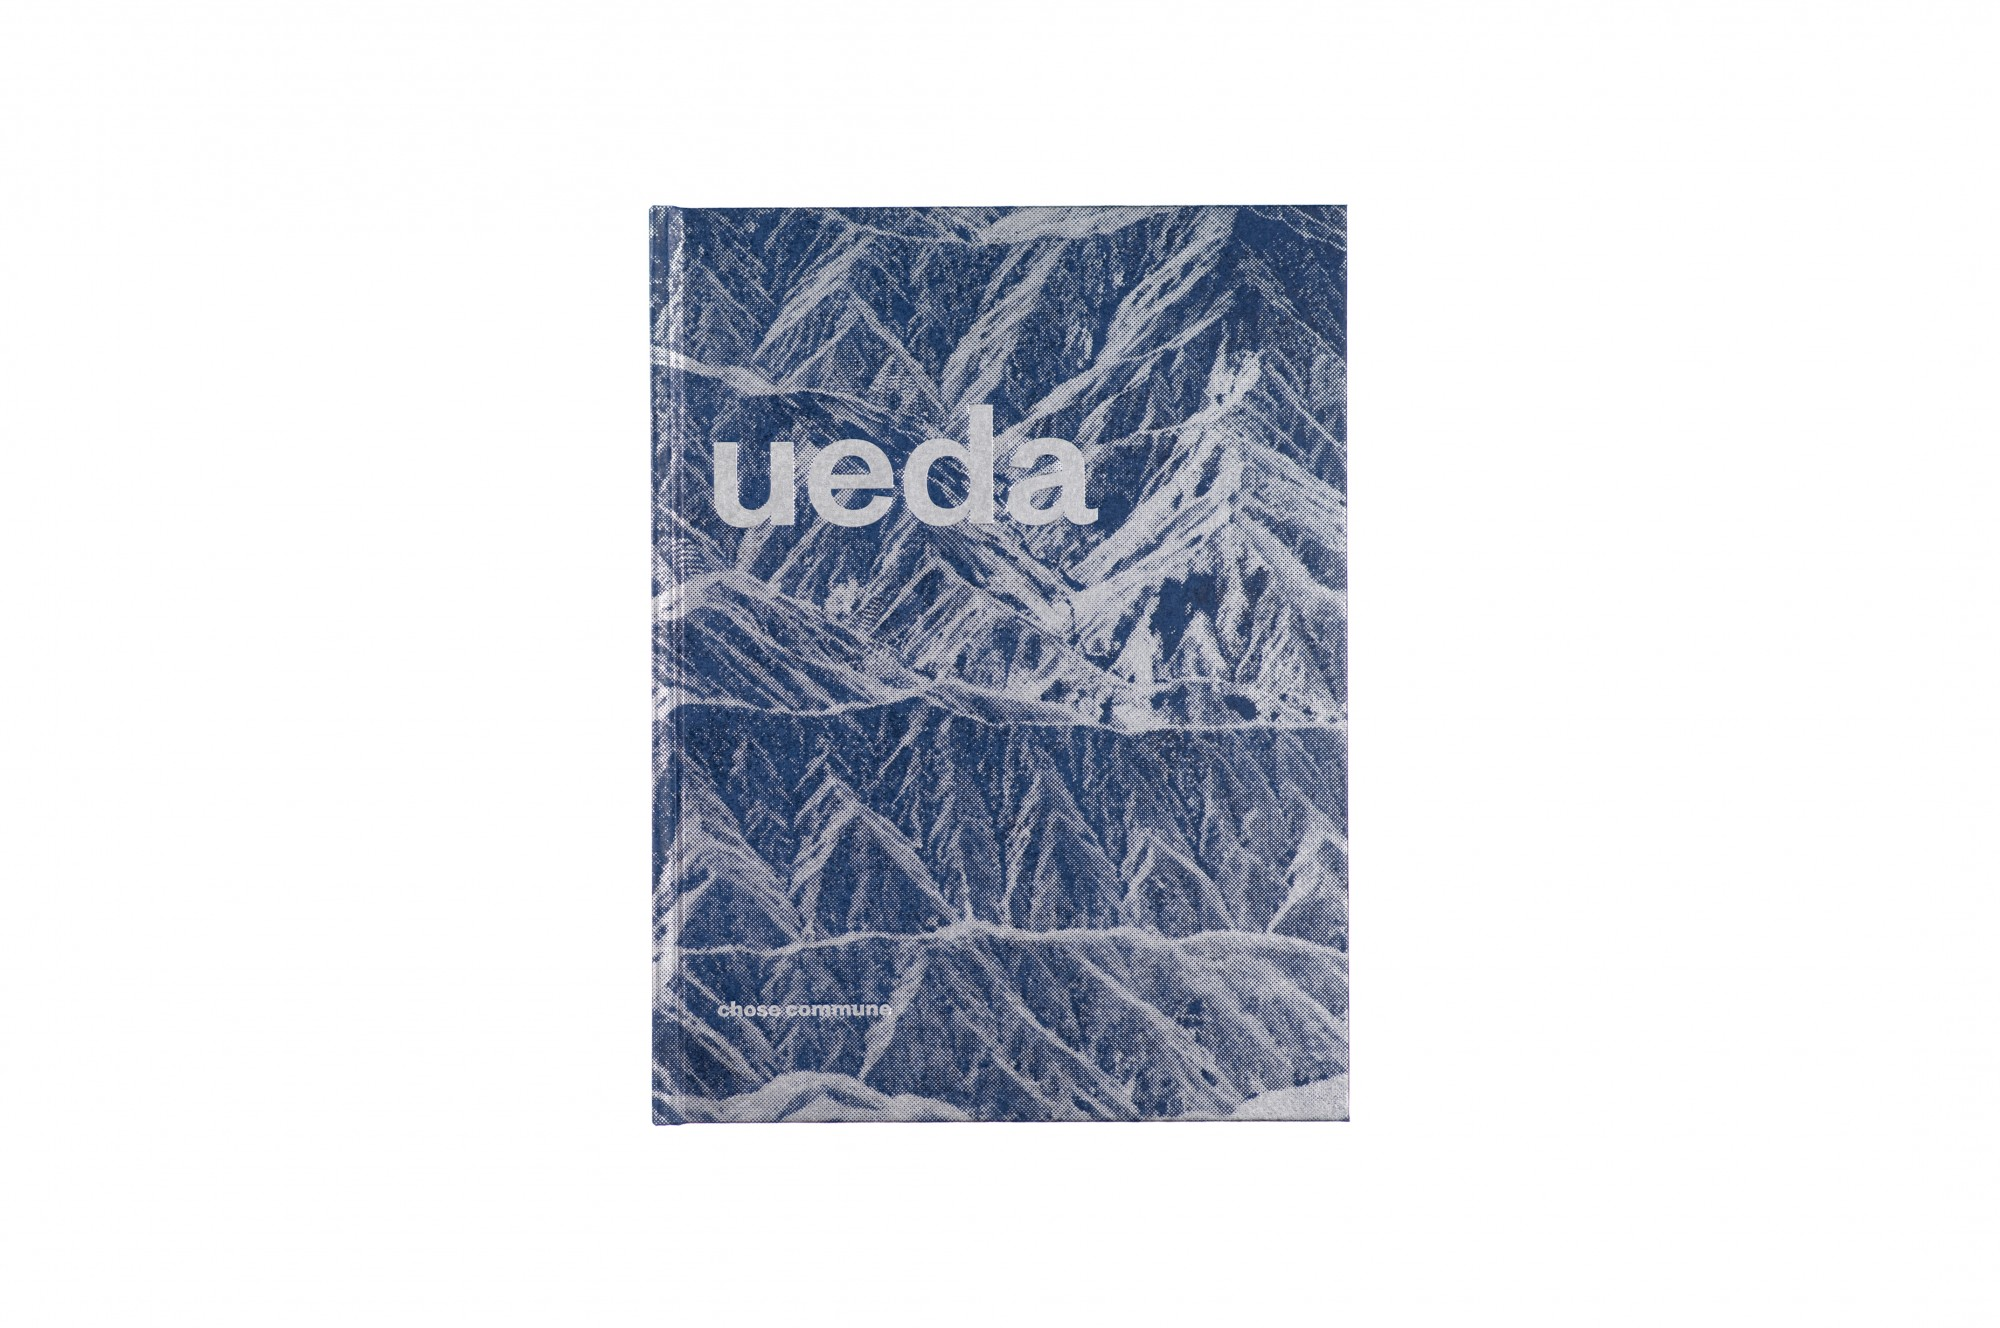 Shōji Ueda - Seconde édition